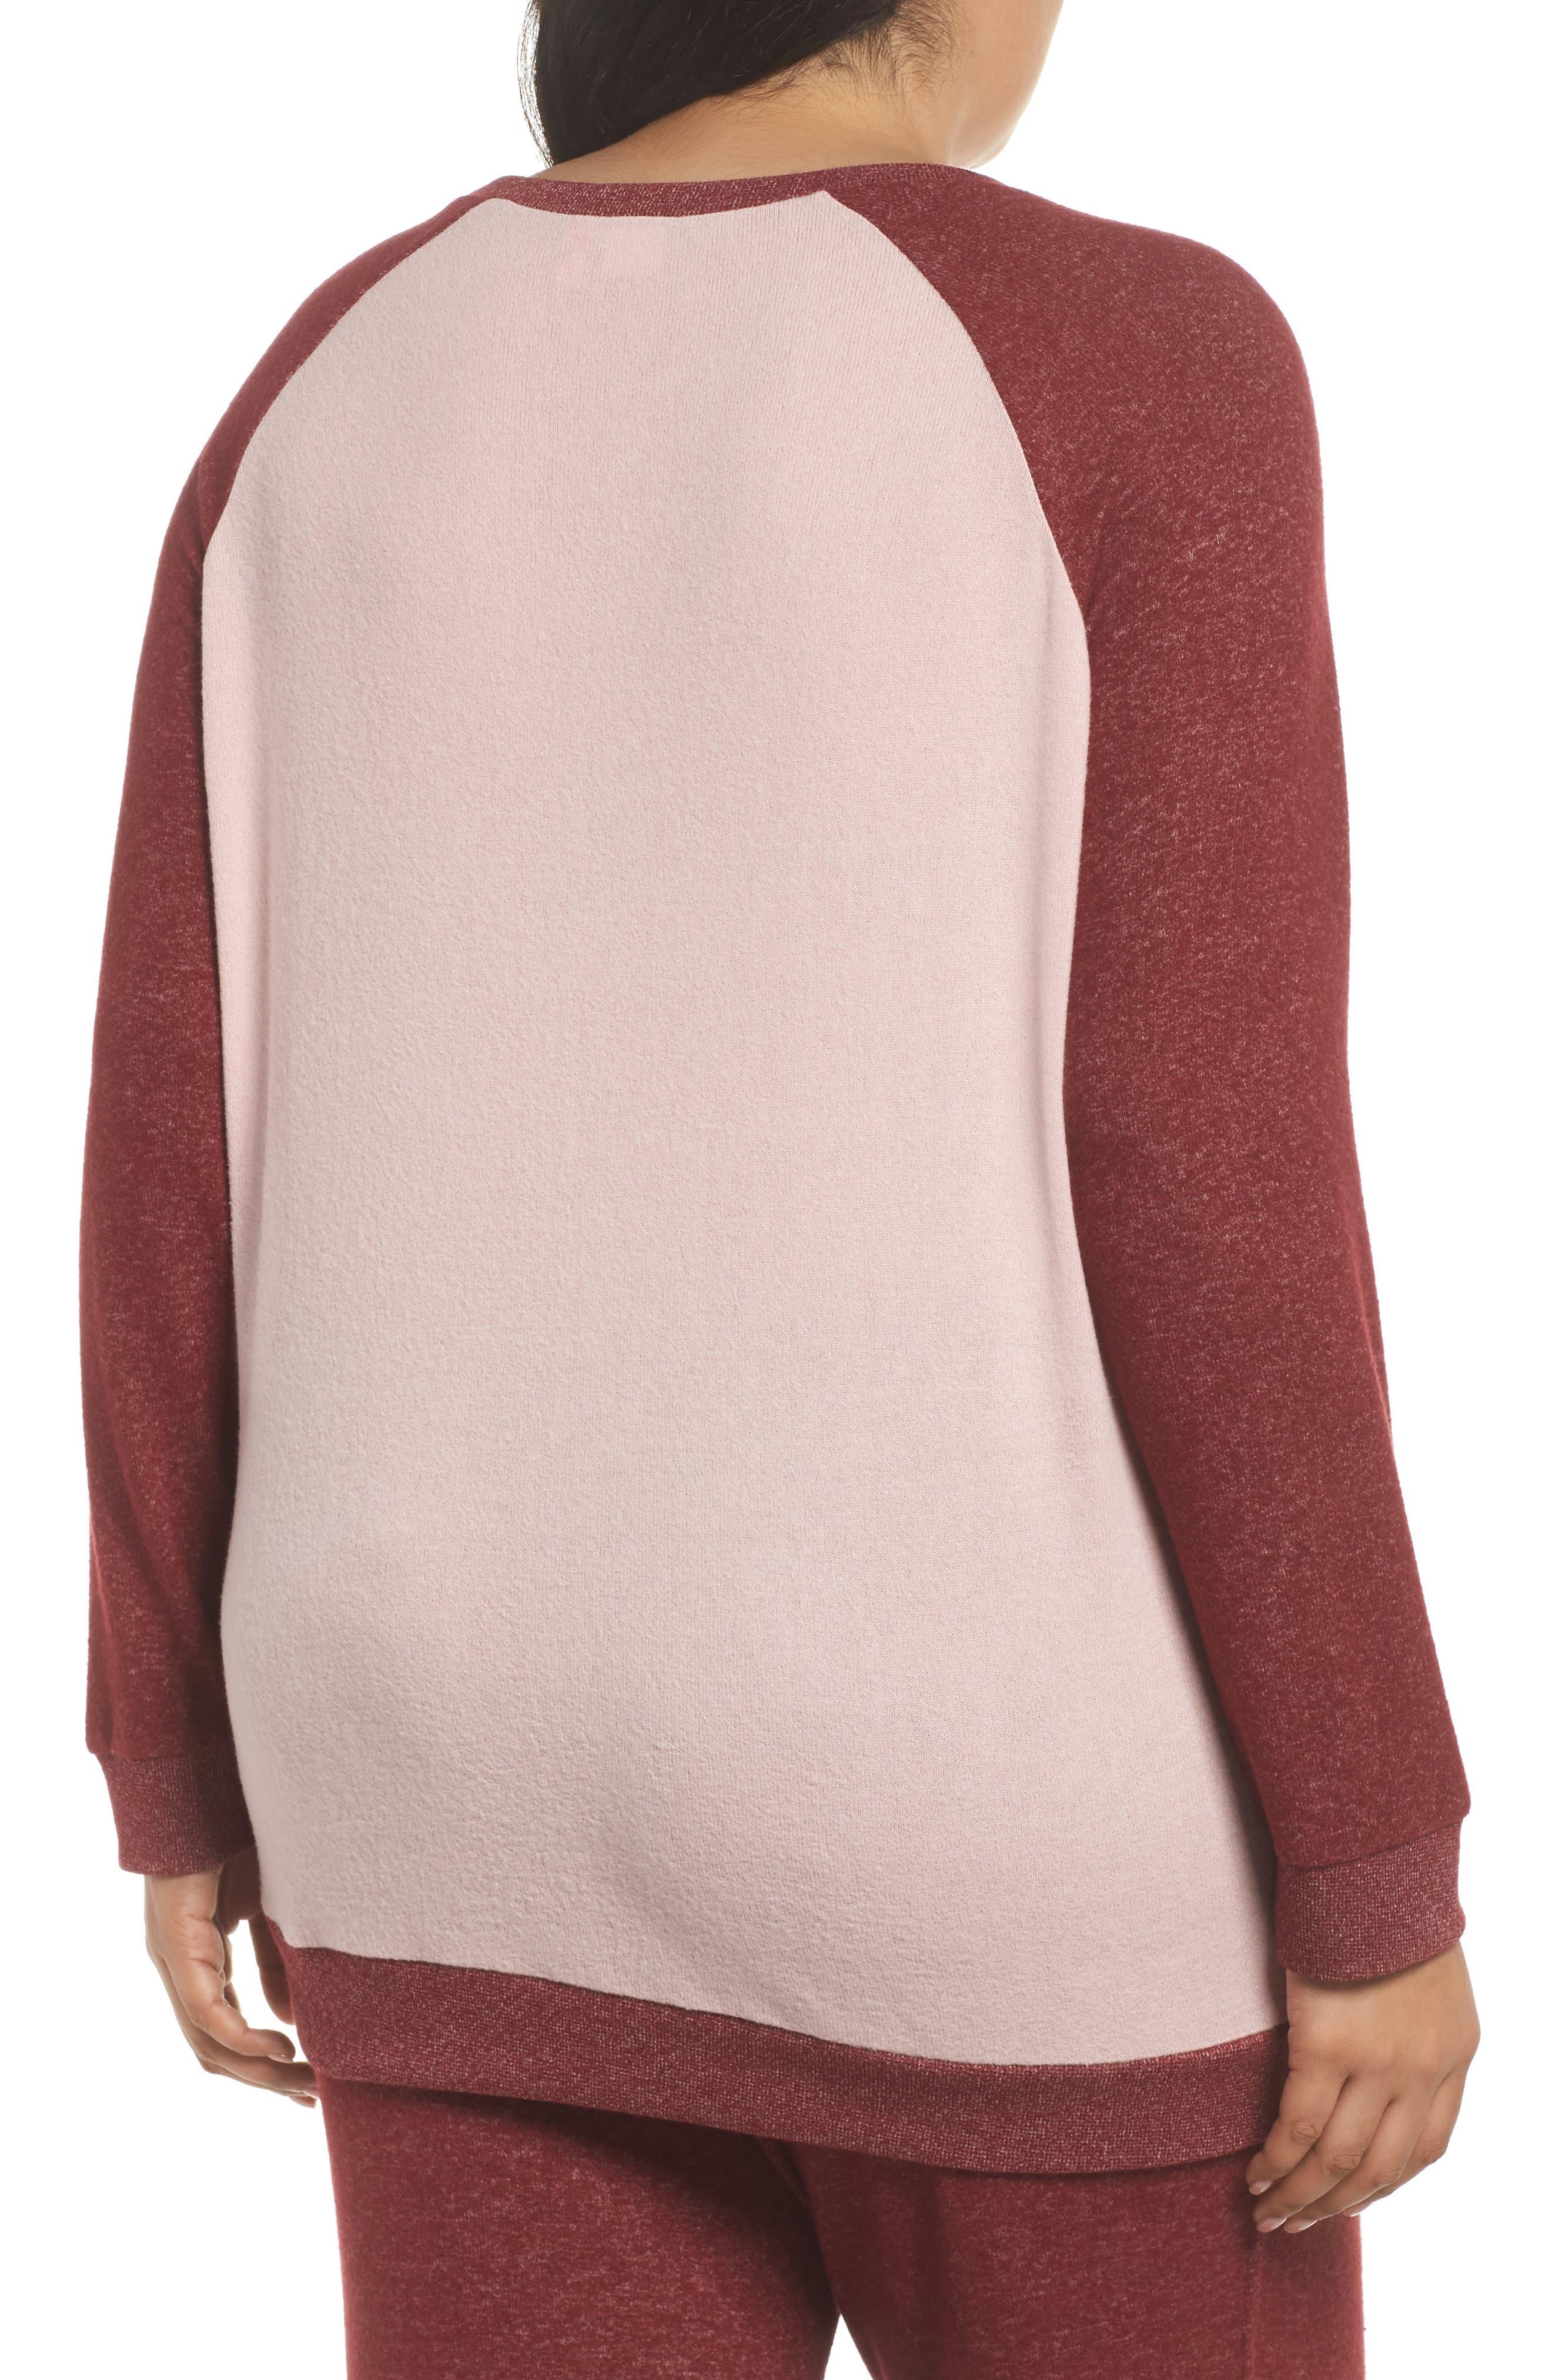 Alternate Image 2  - Make + Model Cozy Crew Lounge Sweater (Plus Size)